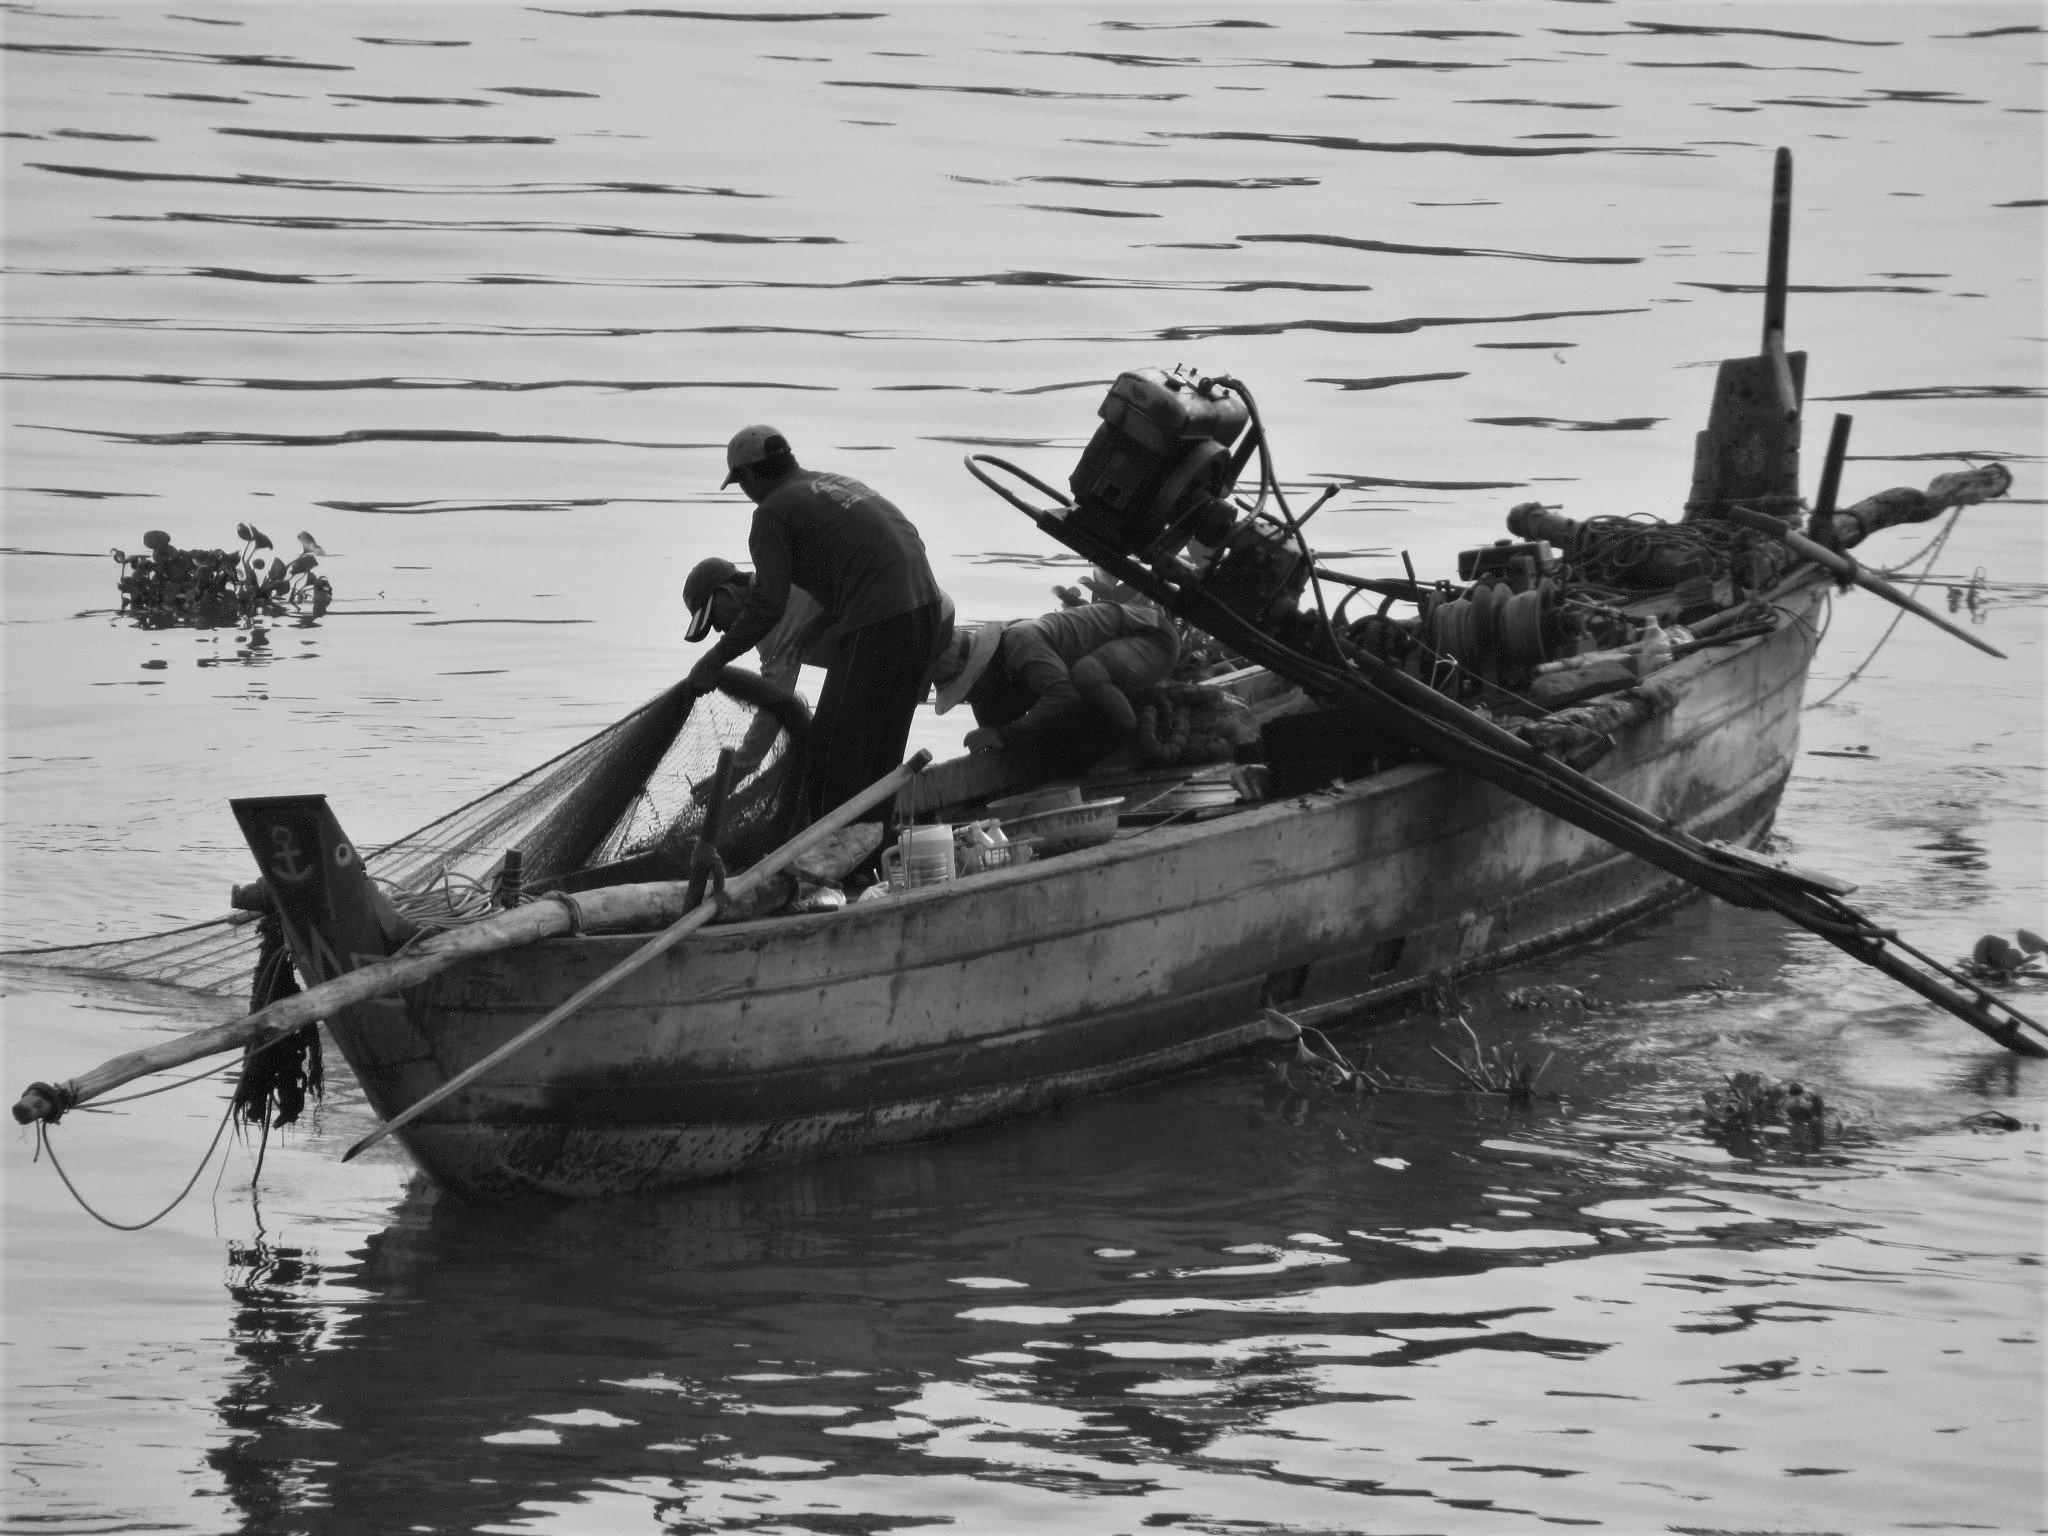 Fishing boat of the Mekong River, Vietnam